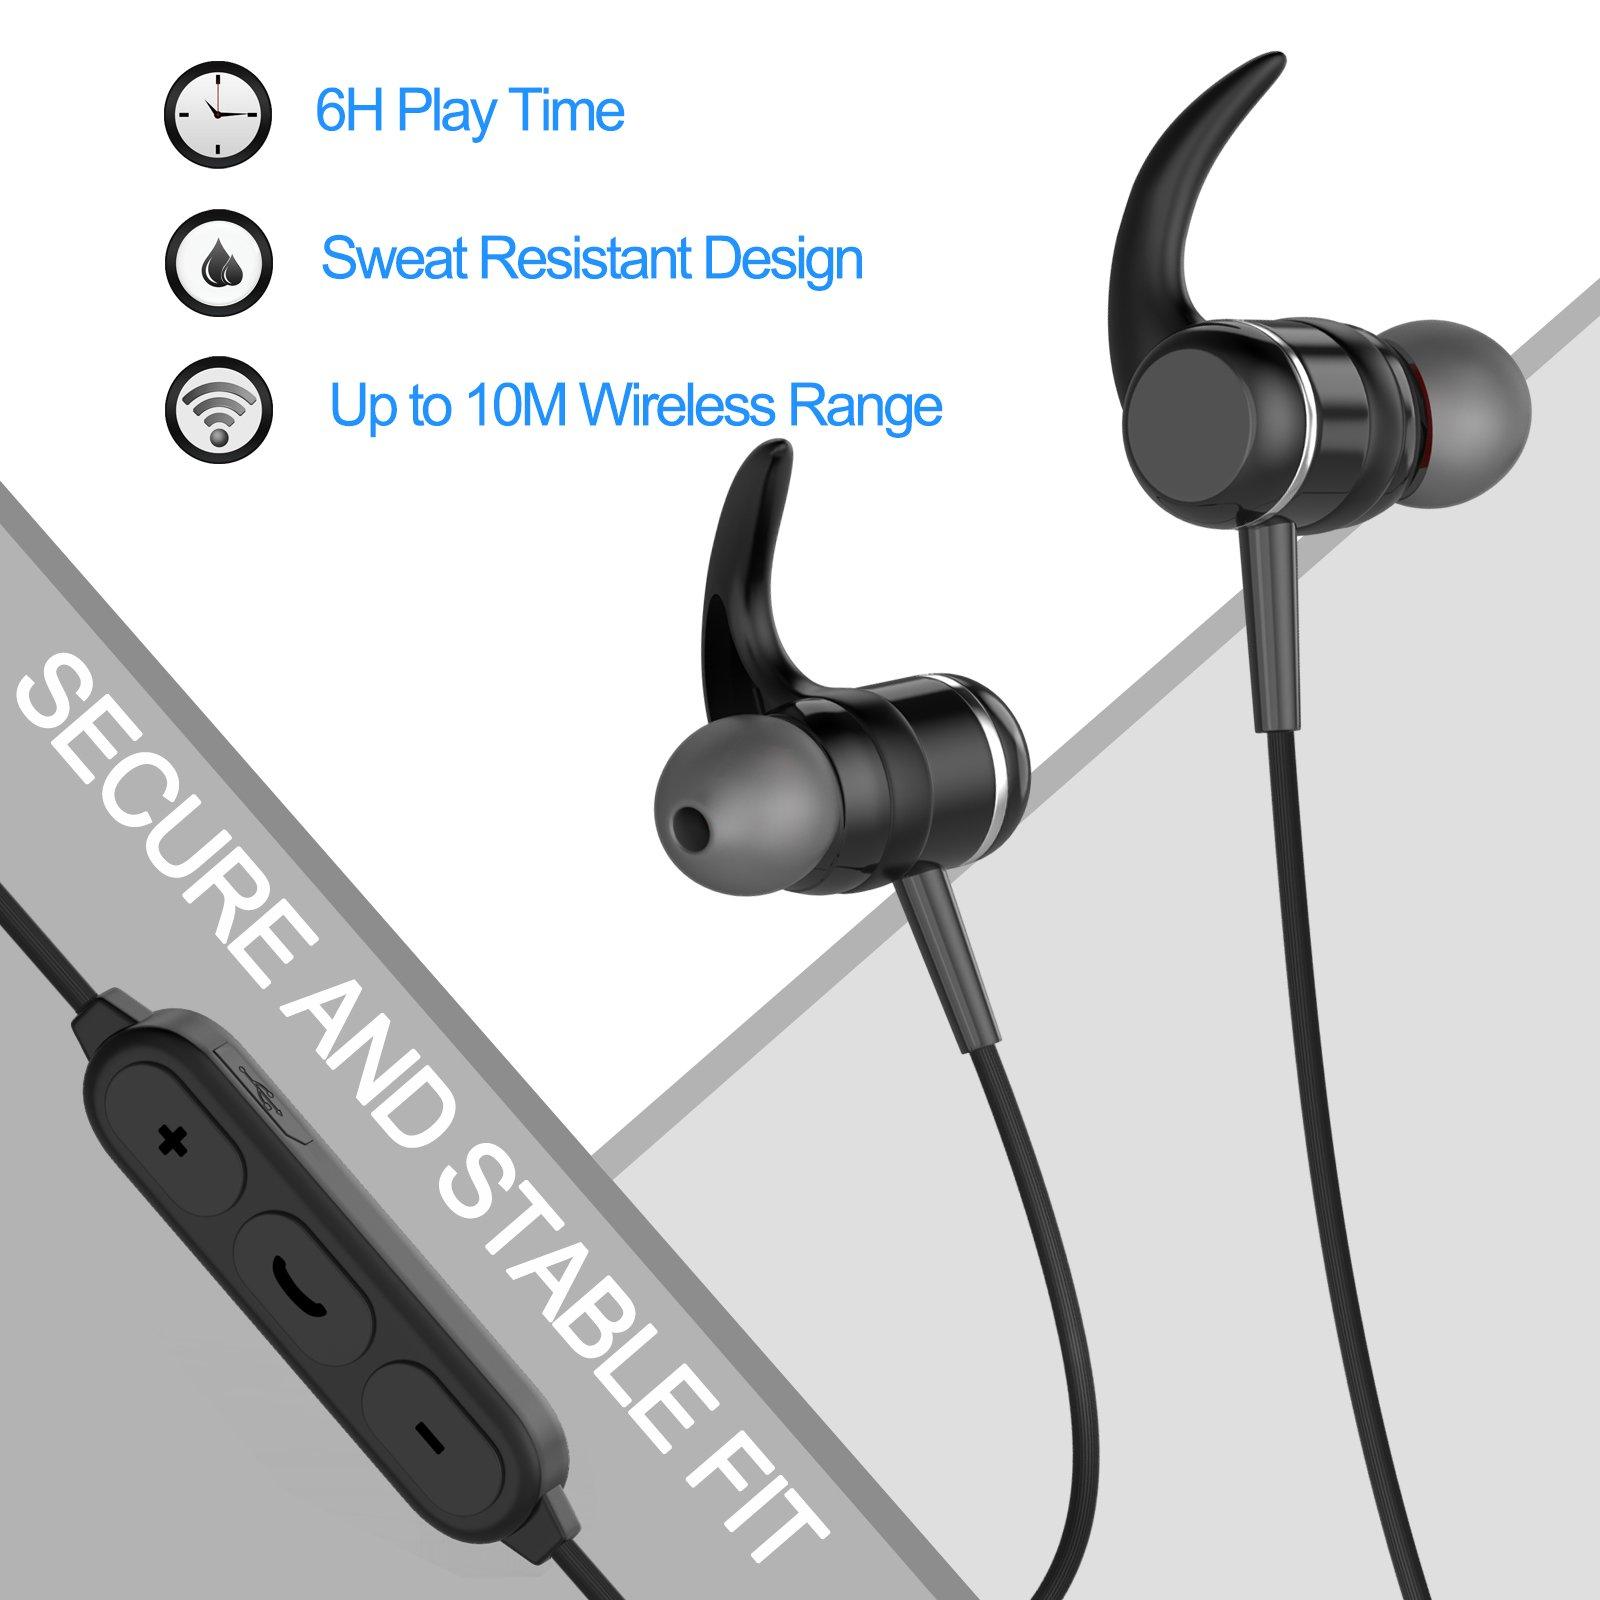 Bluetooth 4.1 Headphones, Sports Earphones w/Mic, Waterproof HD Stereo Earbuds for Gym Running by LIREION (Image #5)